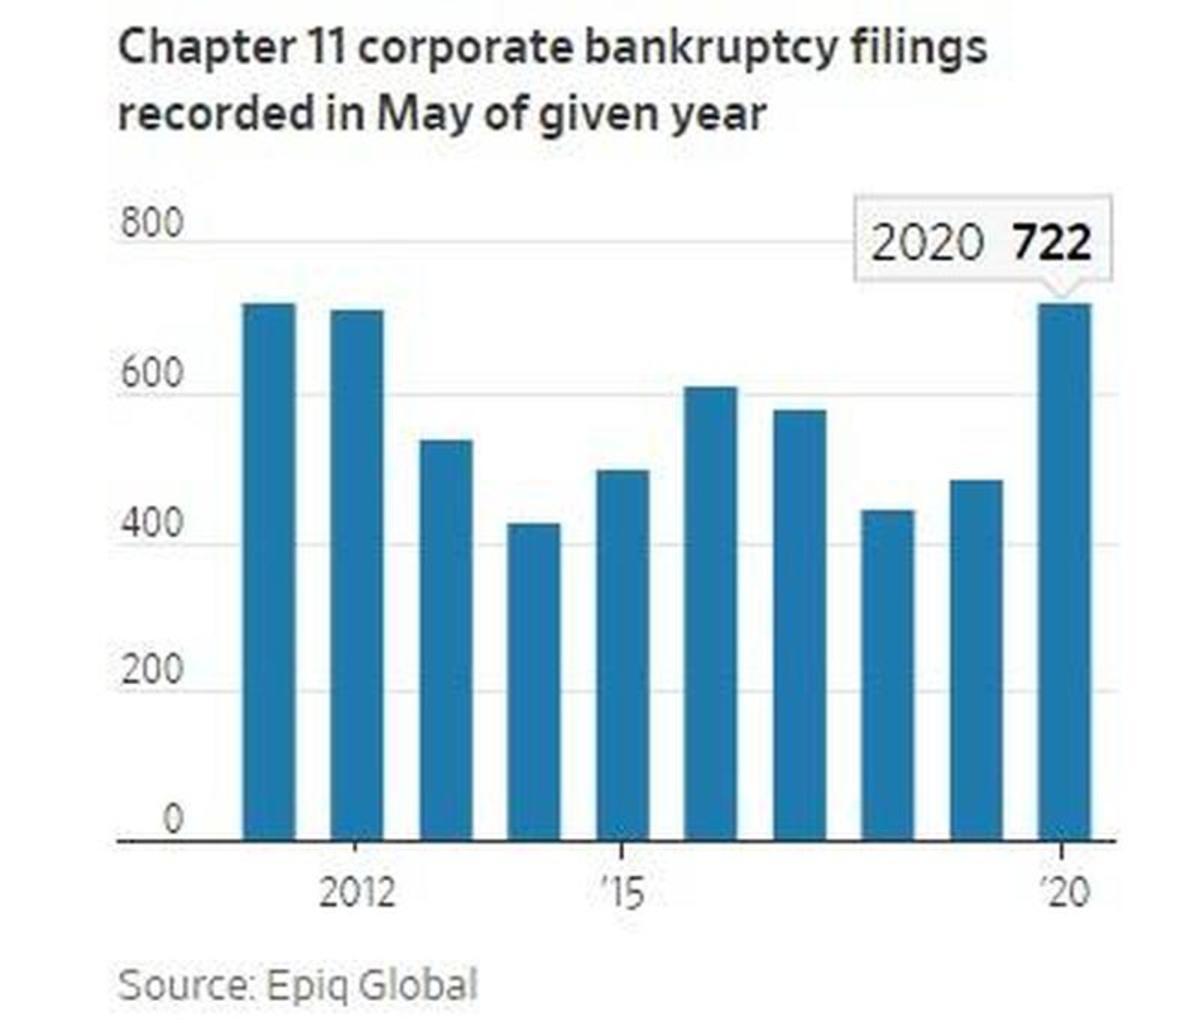 bankrutpcy filings